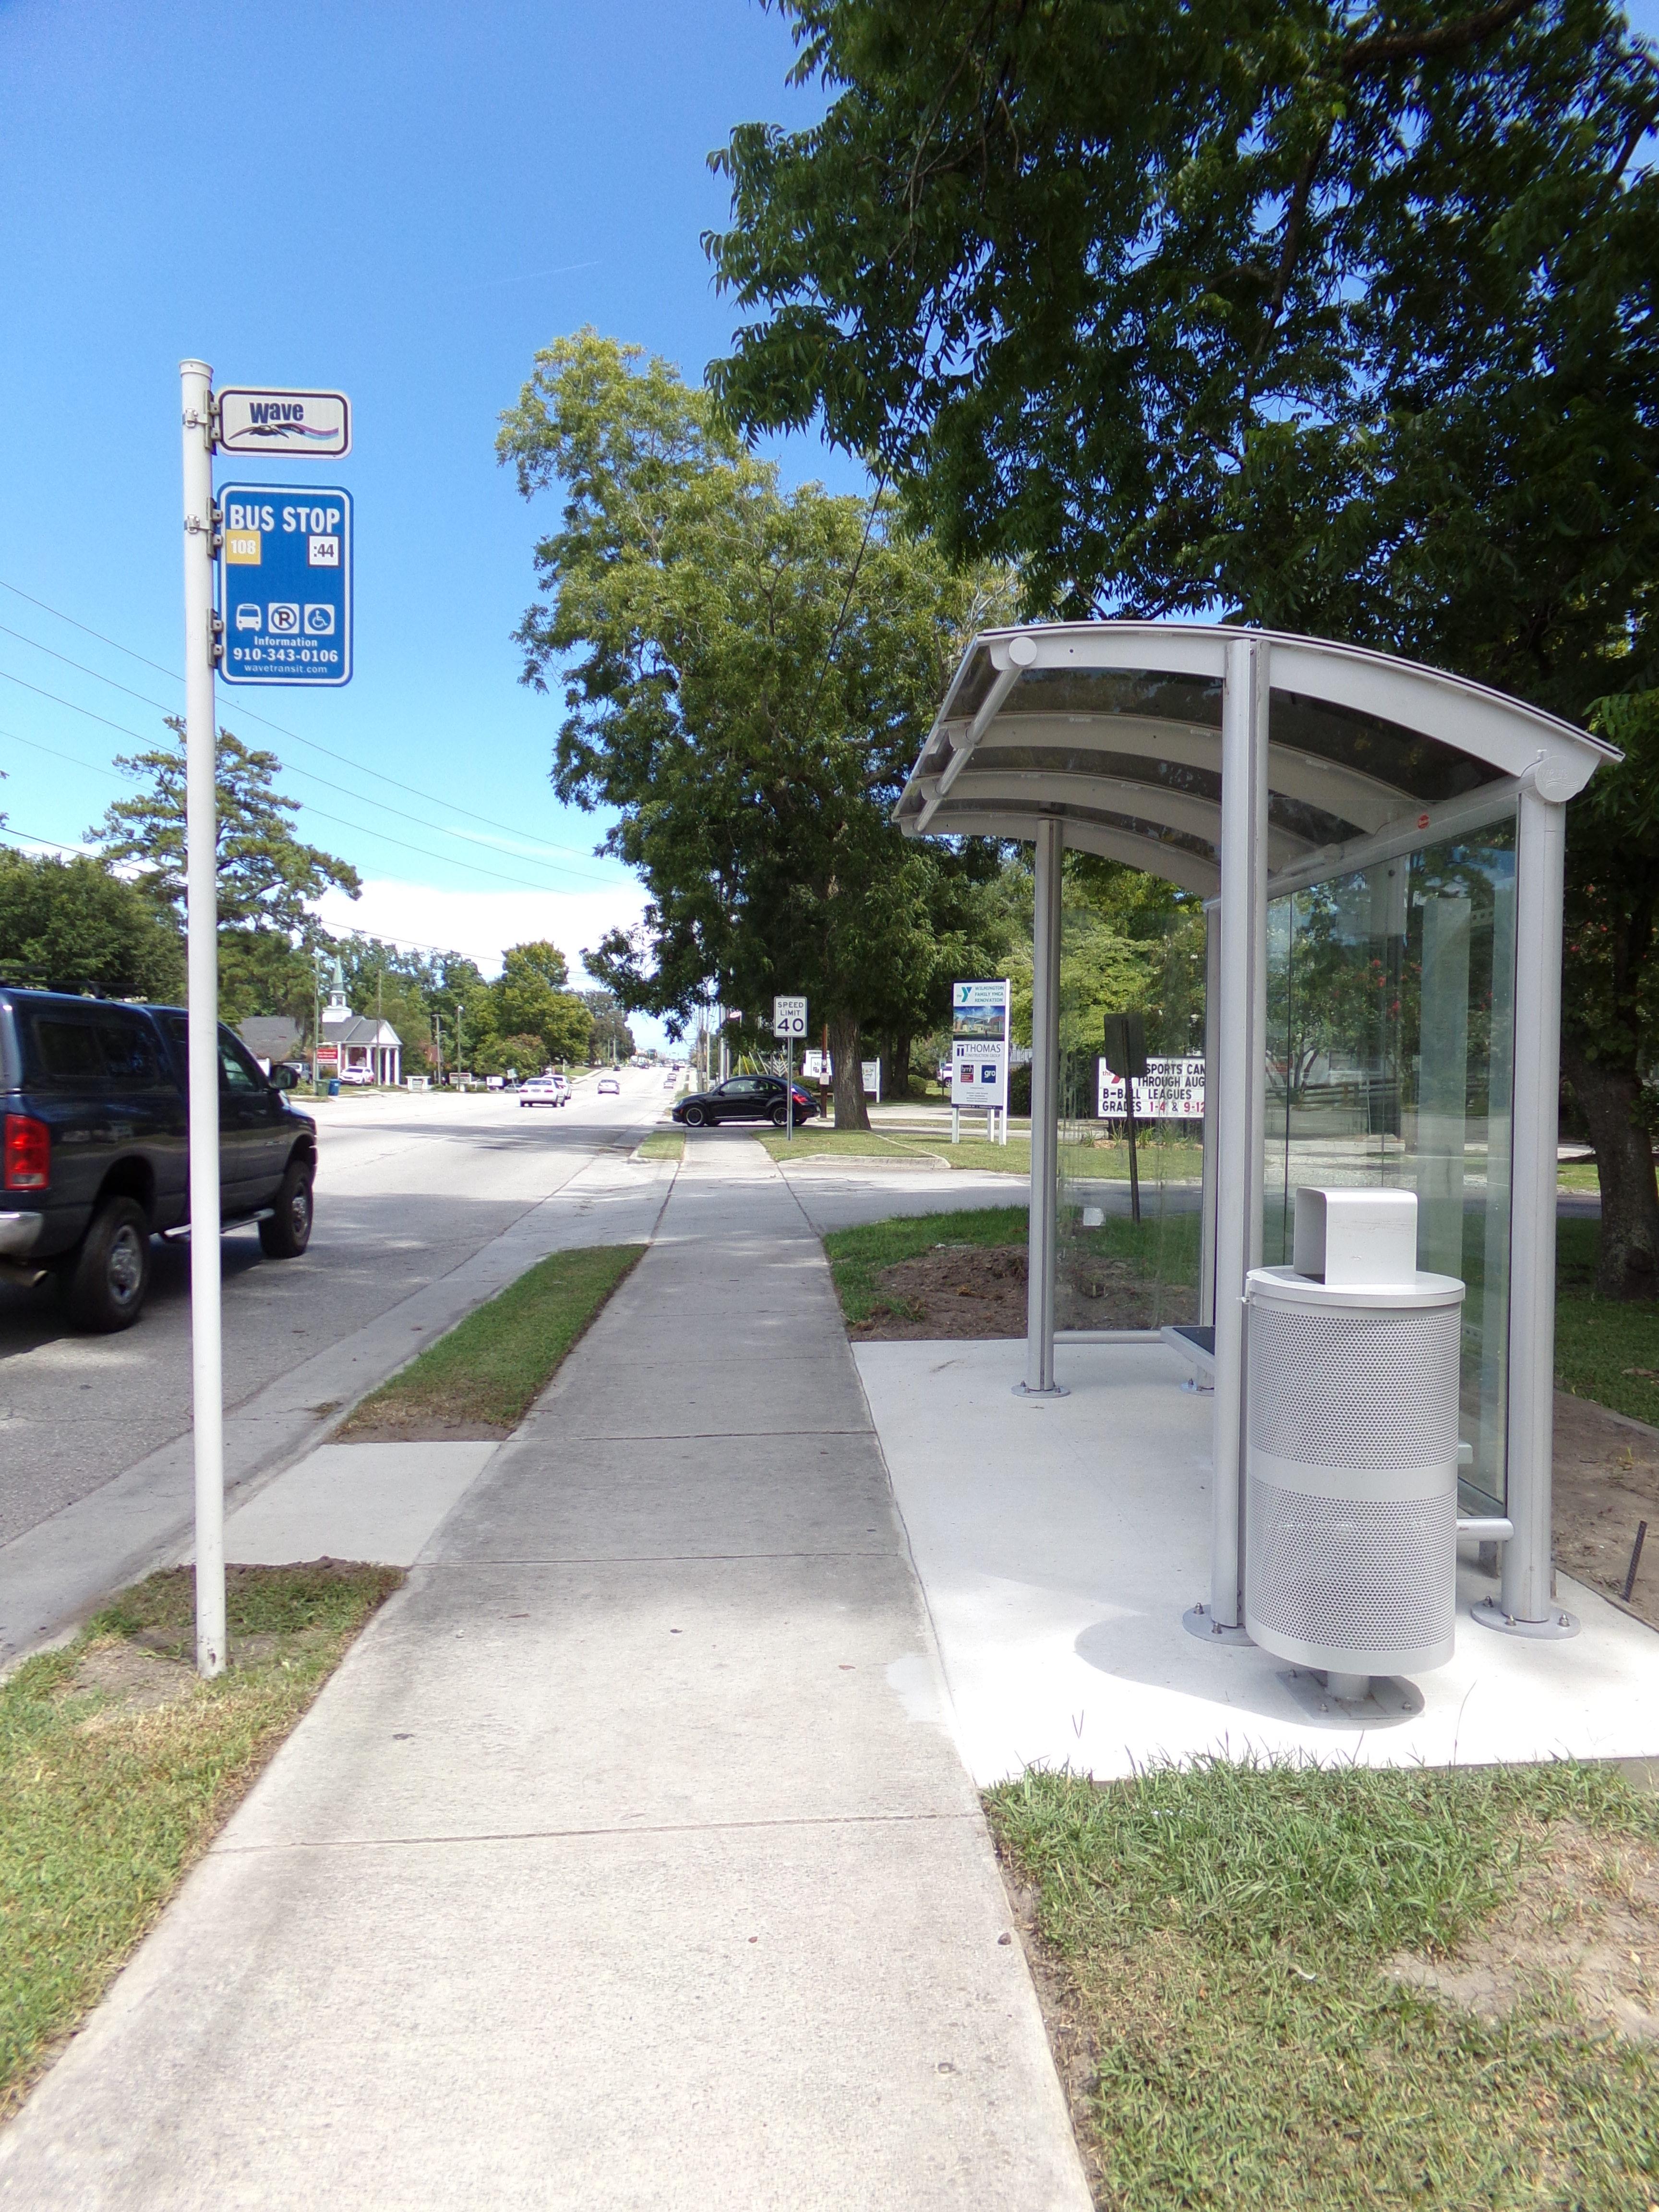 Paratransit Disability Bus Transportation Services